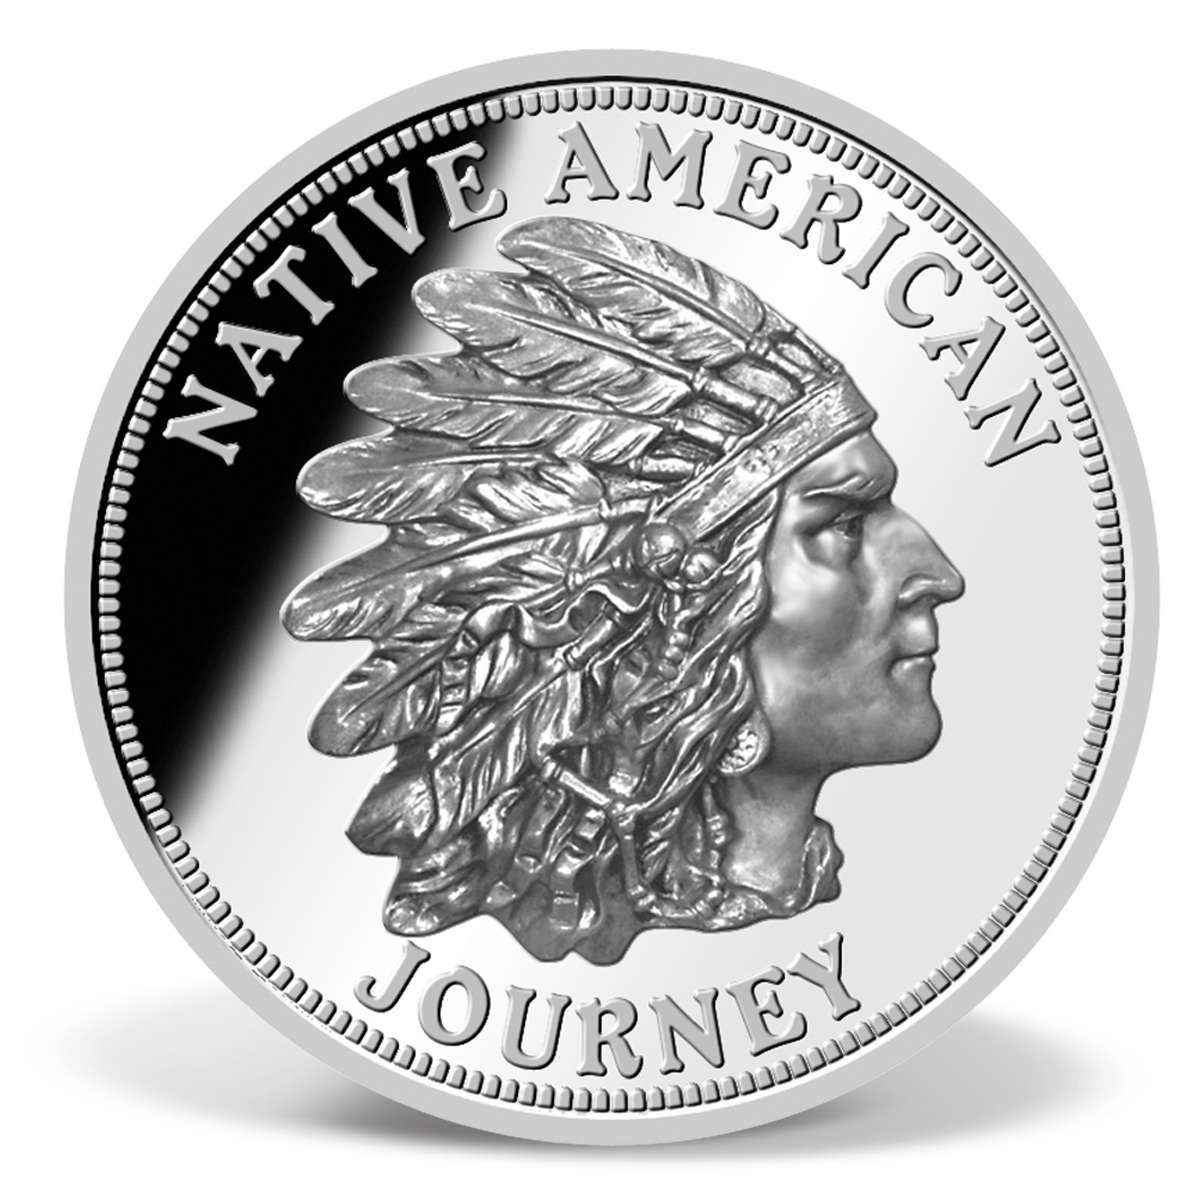 Remain Close To Great Spirit Commemorative Coin Coins Commemorative Coins Commemoration